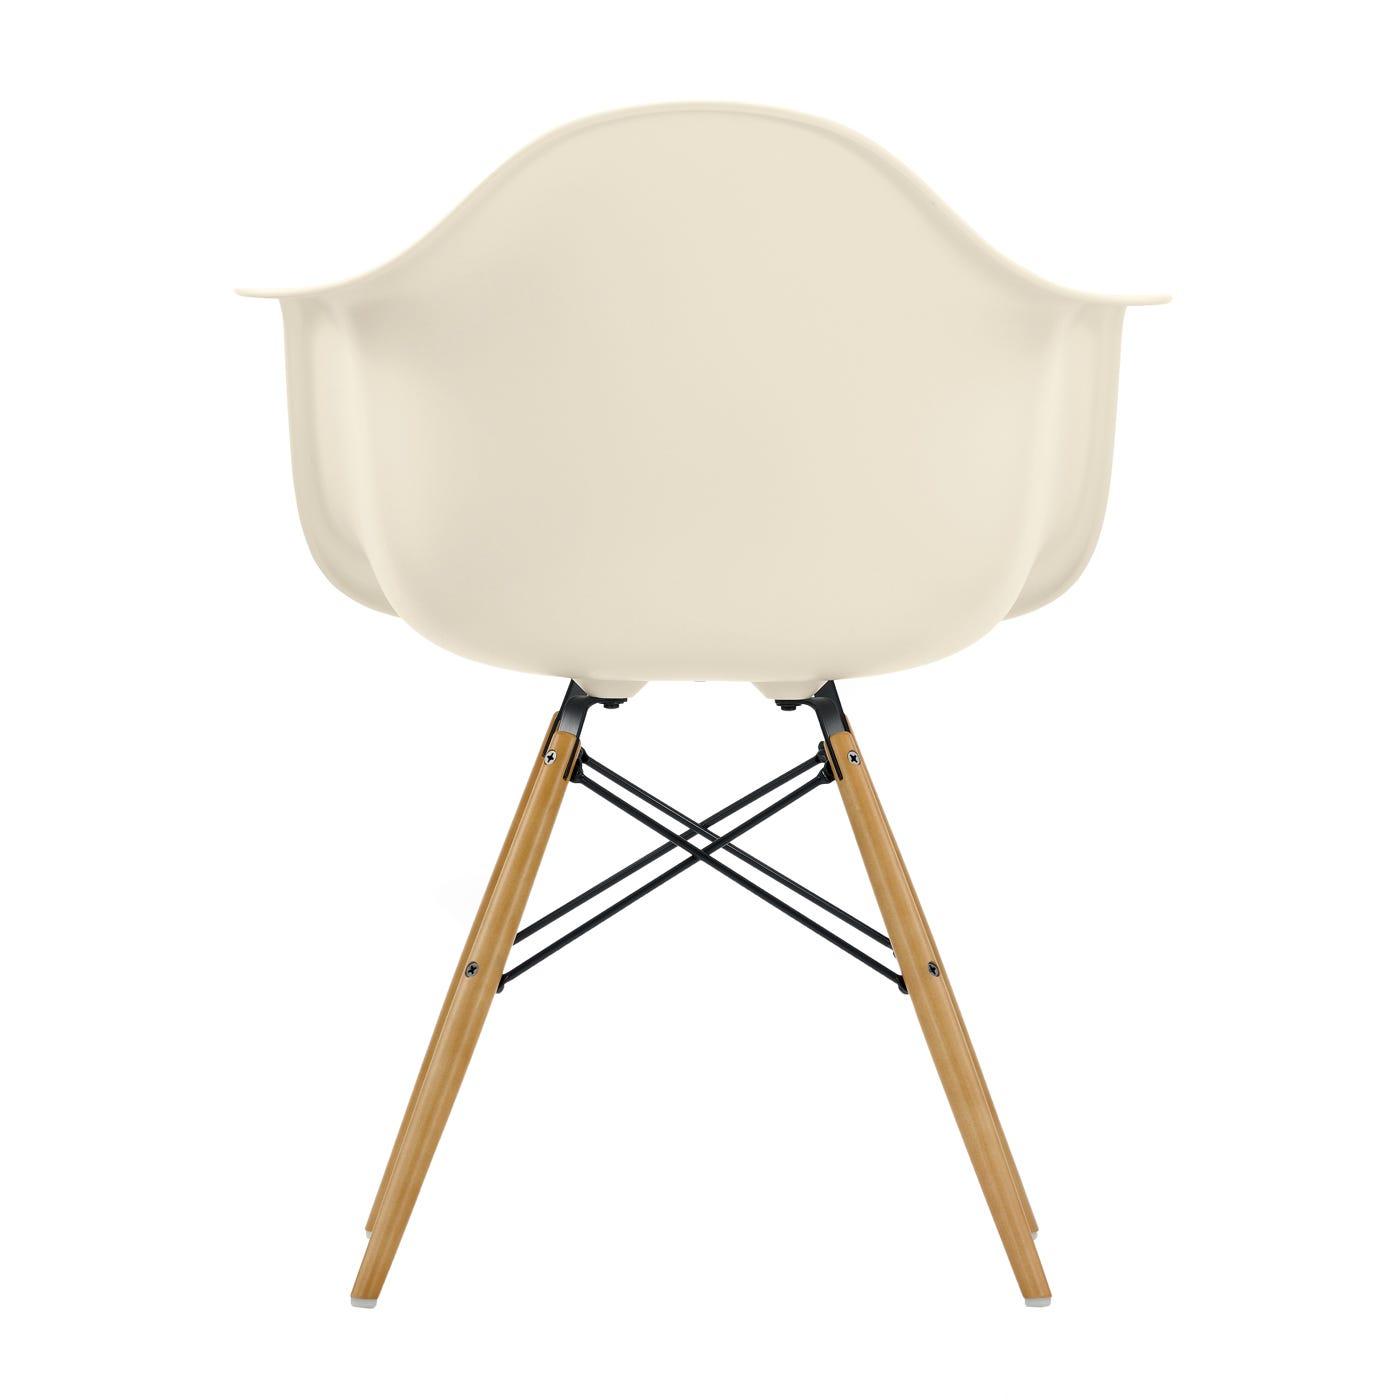 Eames DAW Armchair New Height Cream Ligth Maple